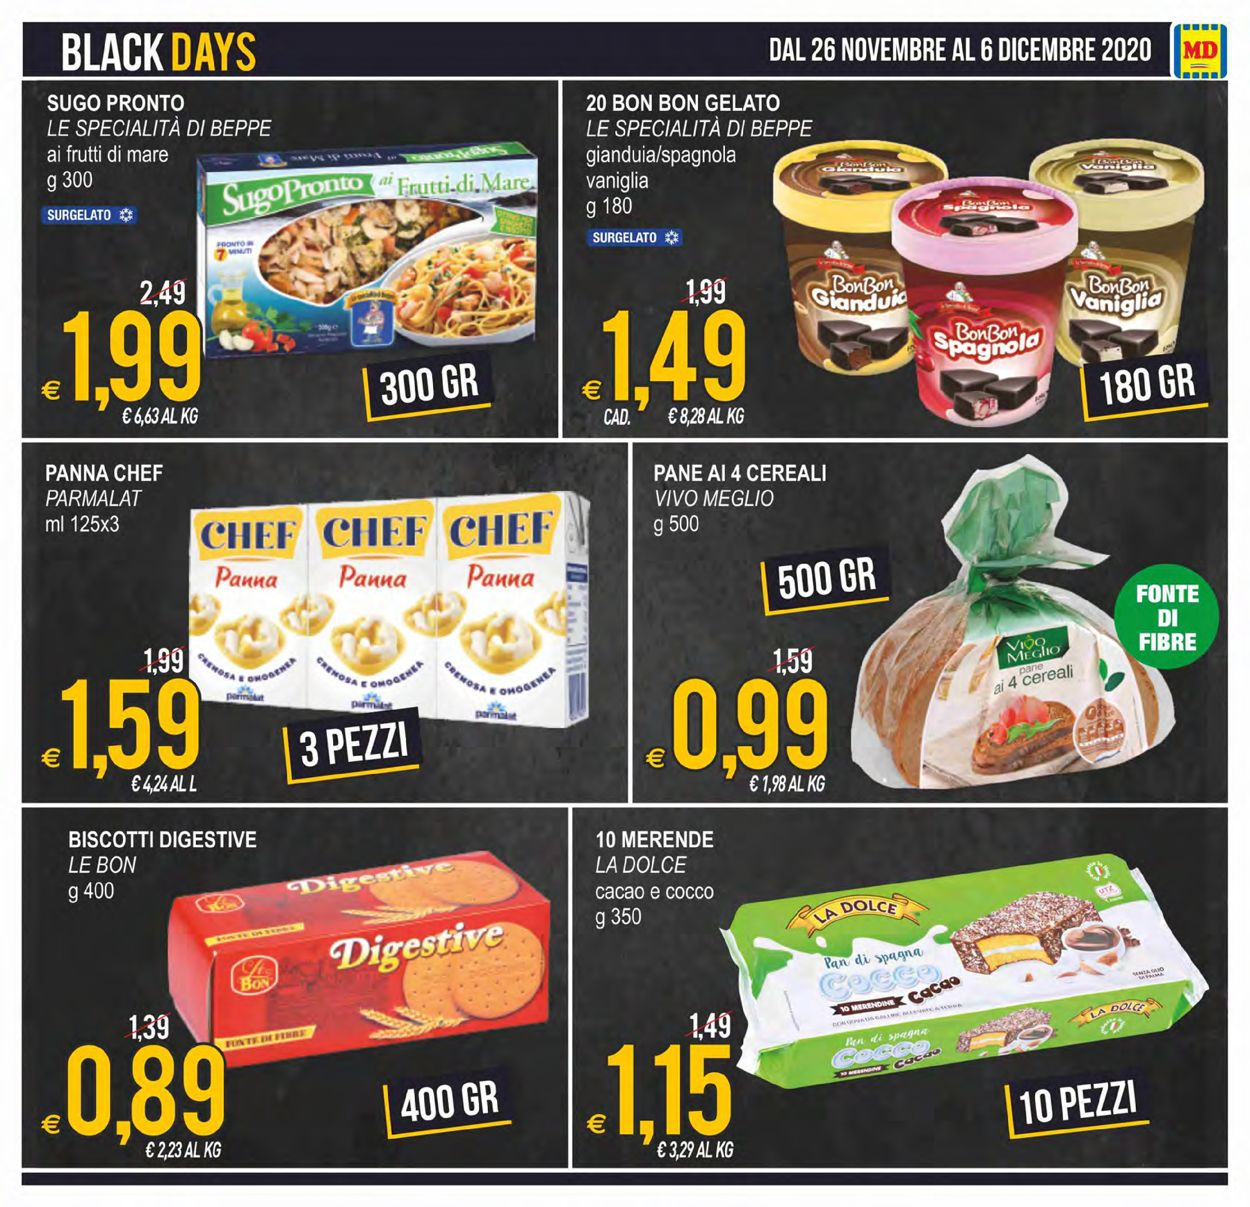 Volantino MD Discount - Black Friday 2020 - Offerte 26/11-06/12/2020 (Pagina 3)